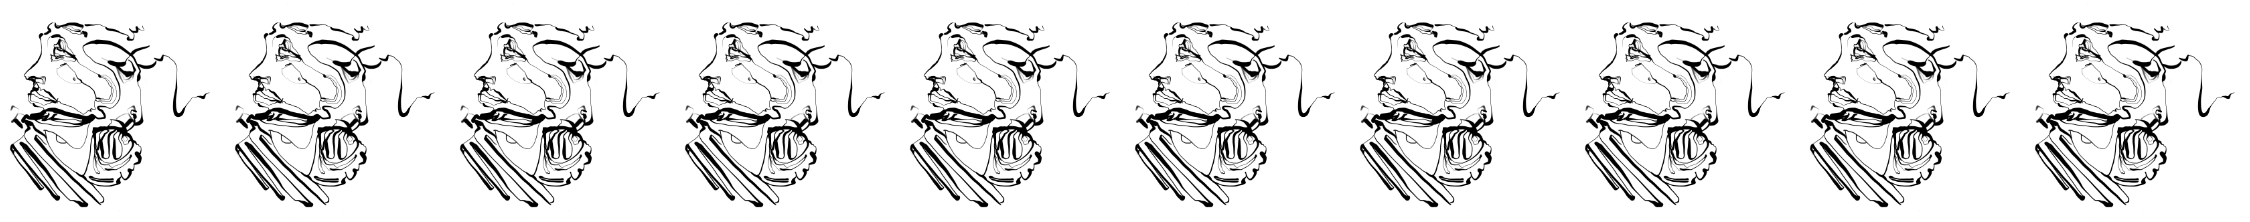 home-bg-pattern